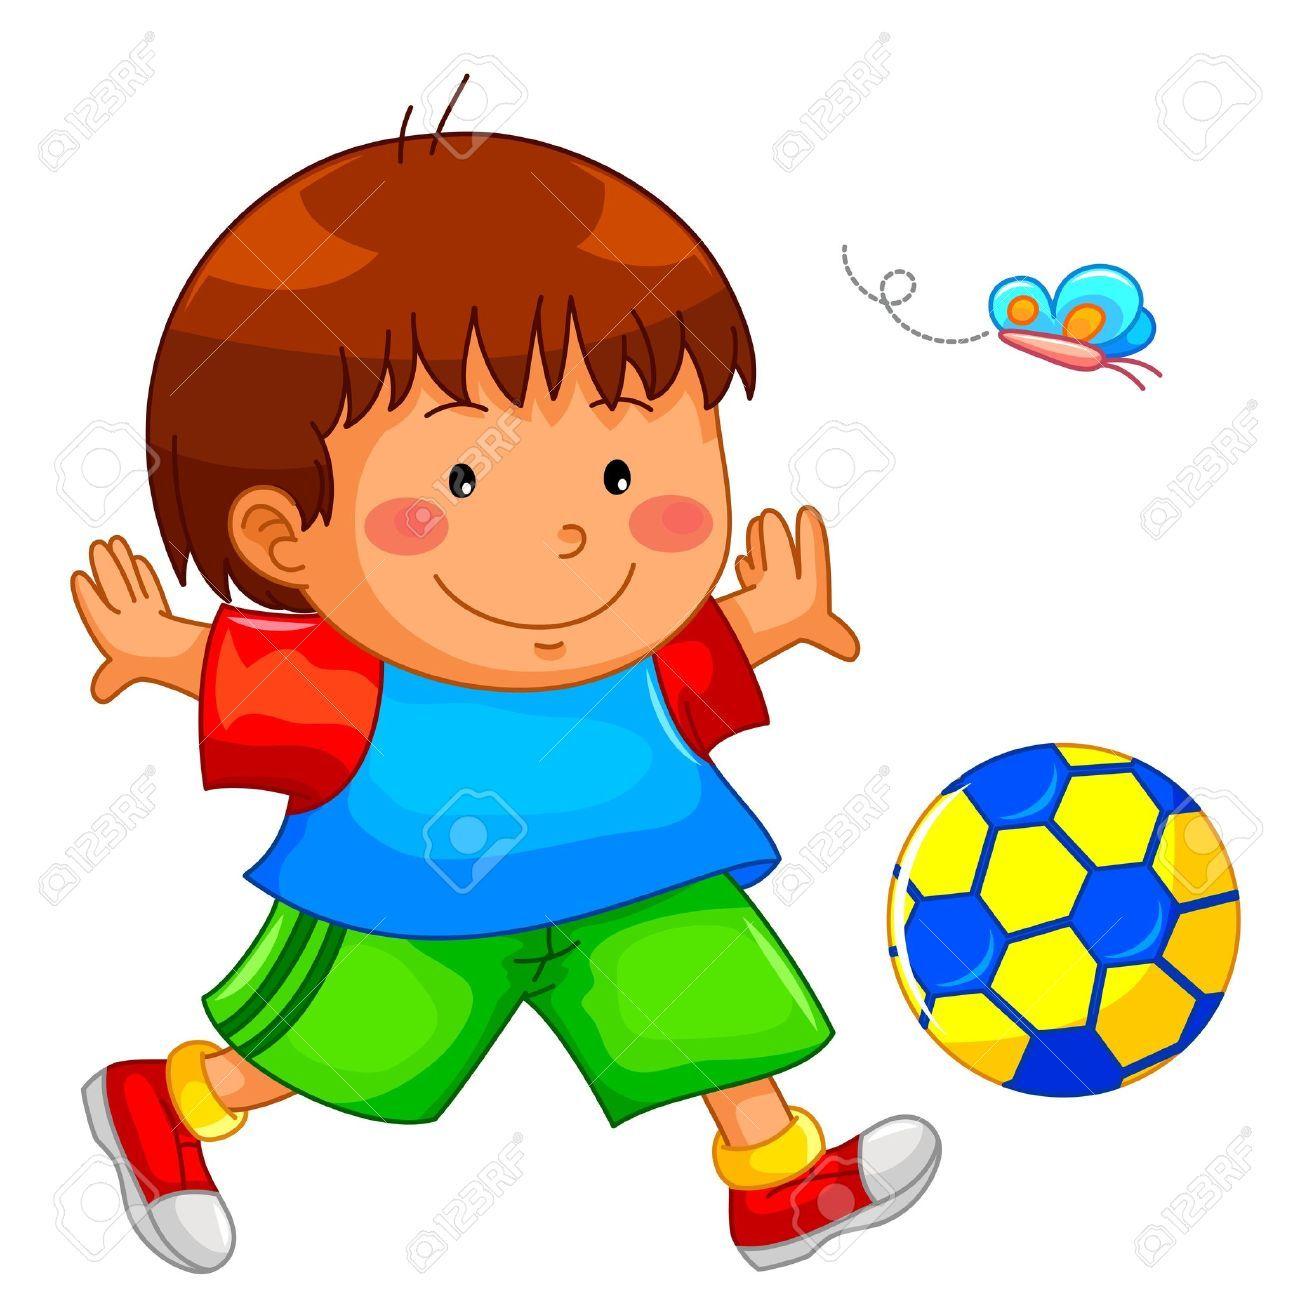 Nino Jugando Con Pelota Buscar Con Google Ninos Jugando Dibujo De Ninos Jugando Nino Jugando Futbol